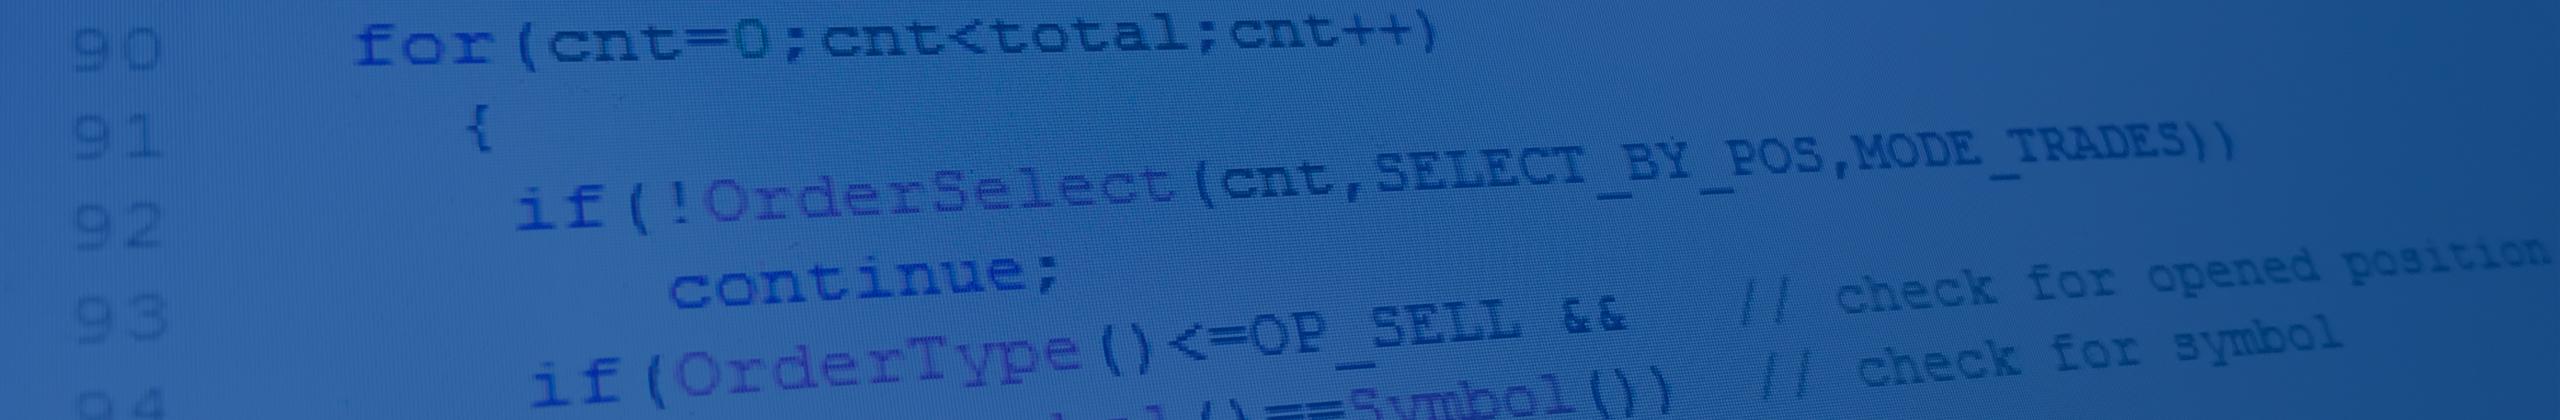 Programación de Expert Advisors y Robots de Trading